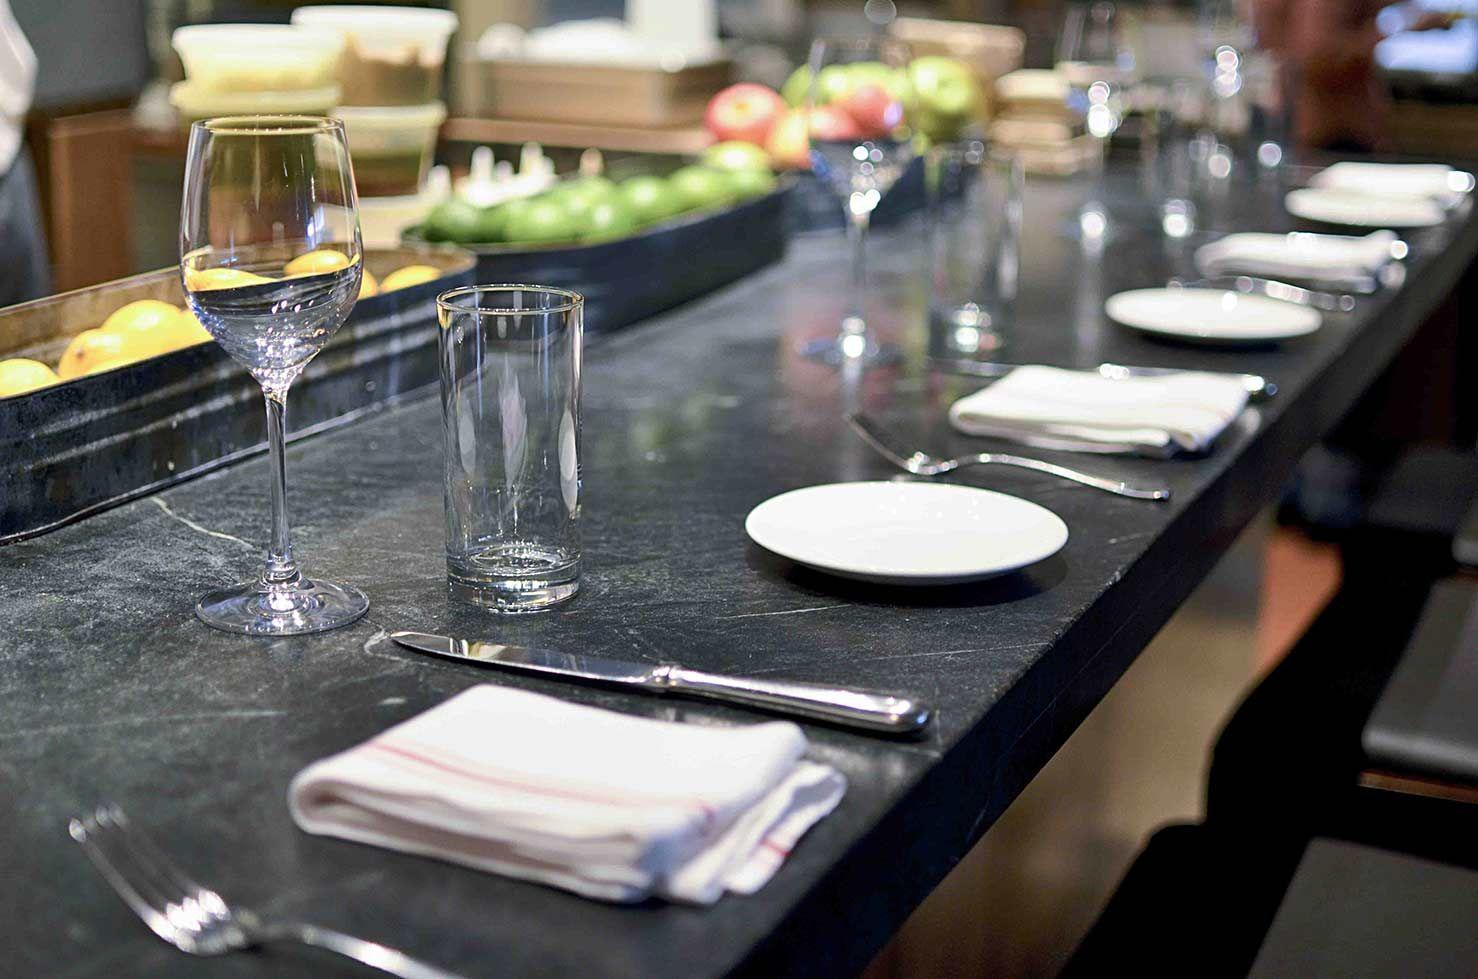 Puritan & Company Modern American New England Cuisine